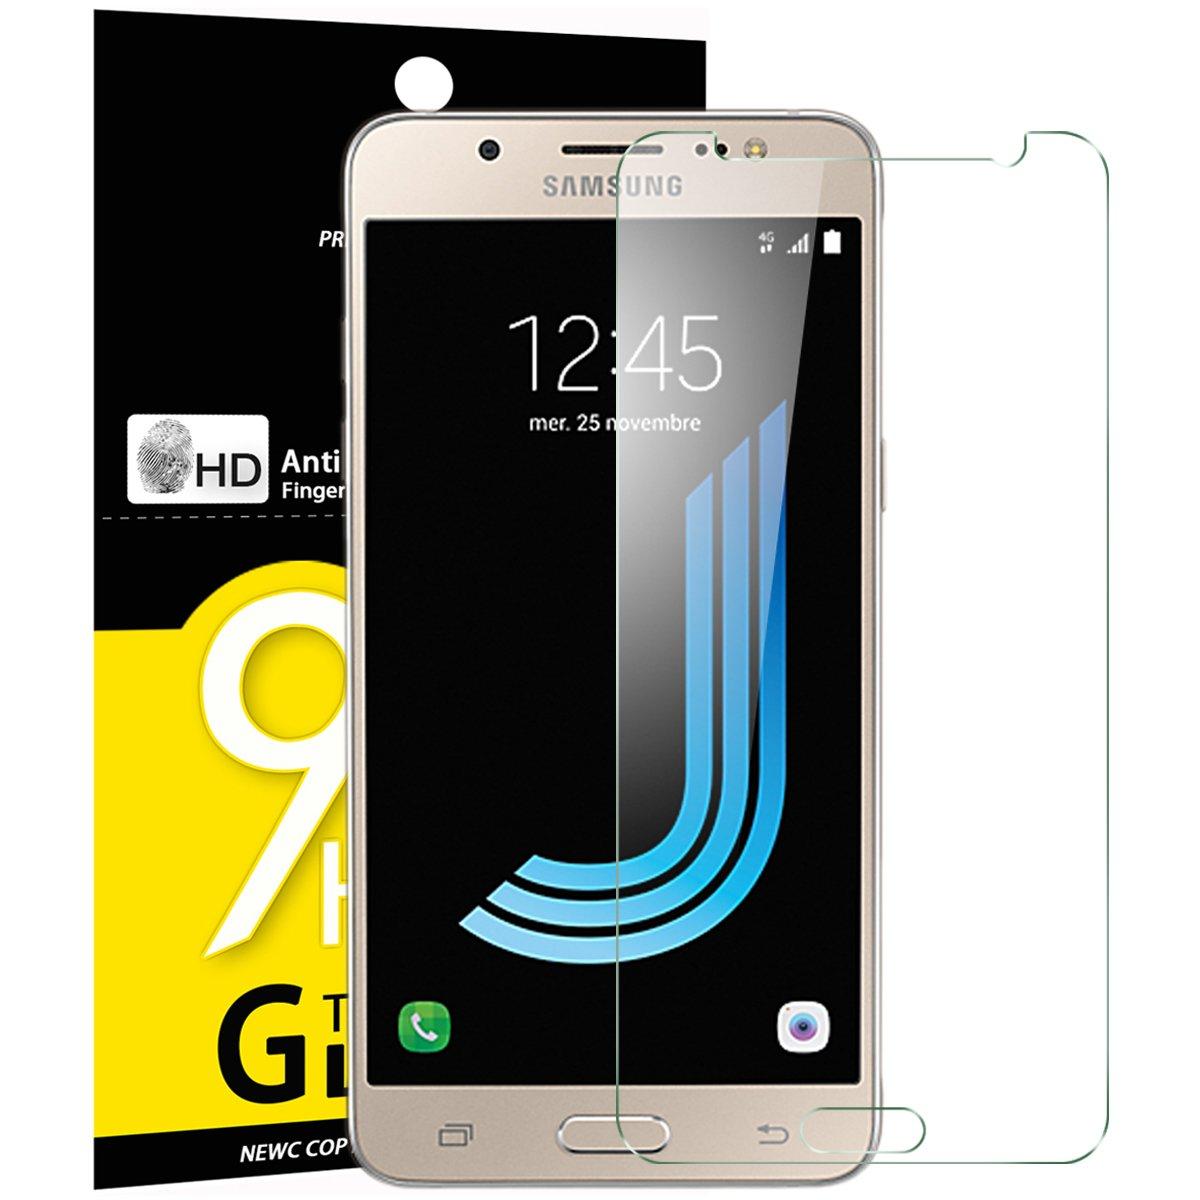 "Célèbre Coque Samsung Galaxy J5 (2016) design Citation ""Rebelle"" Texte  UI55"